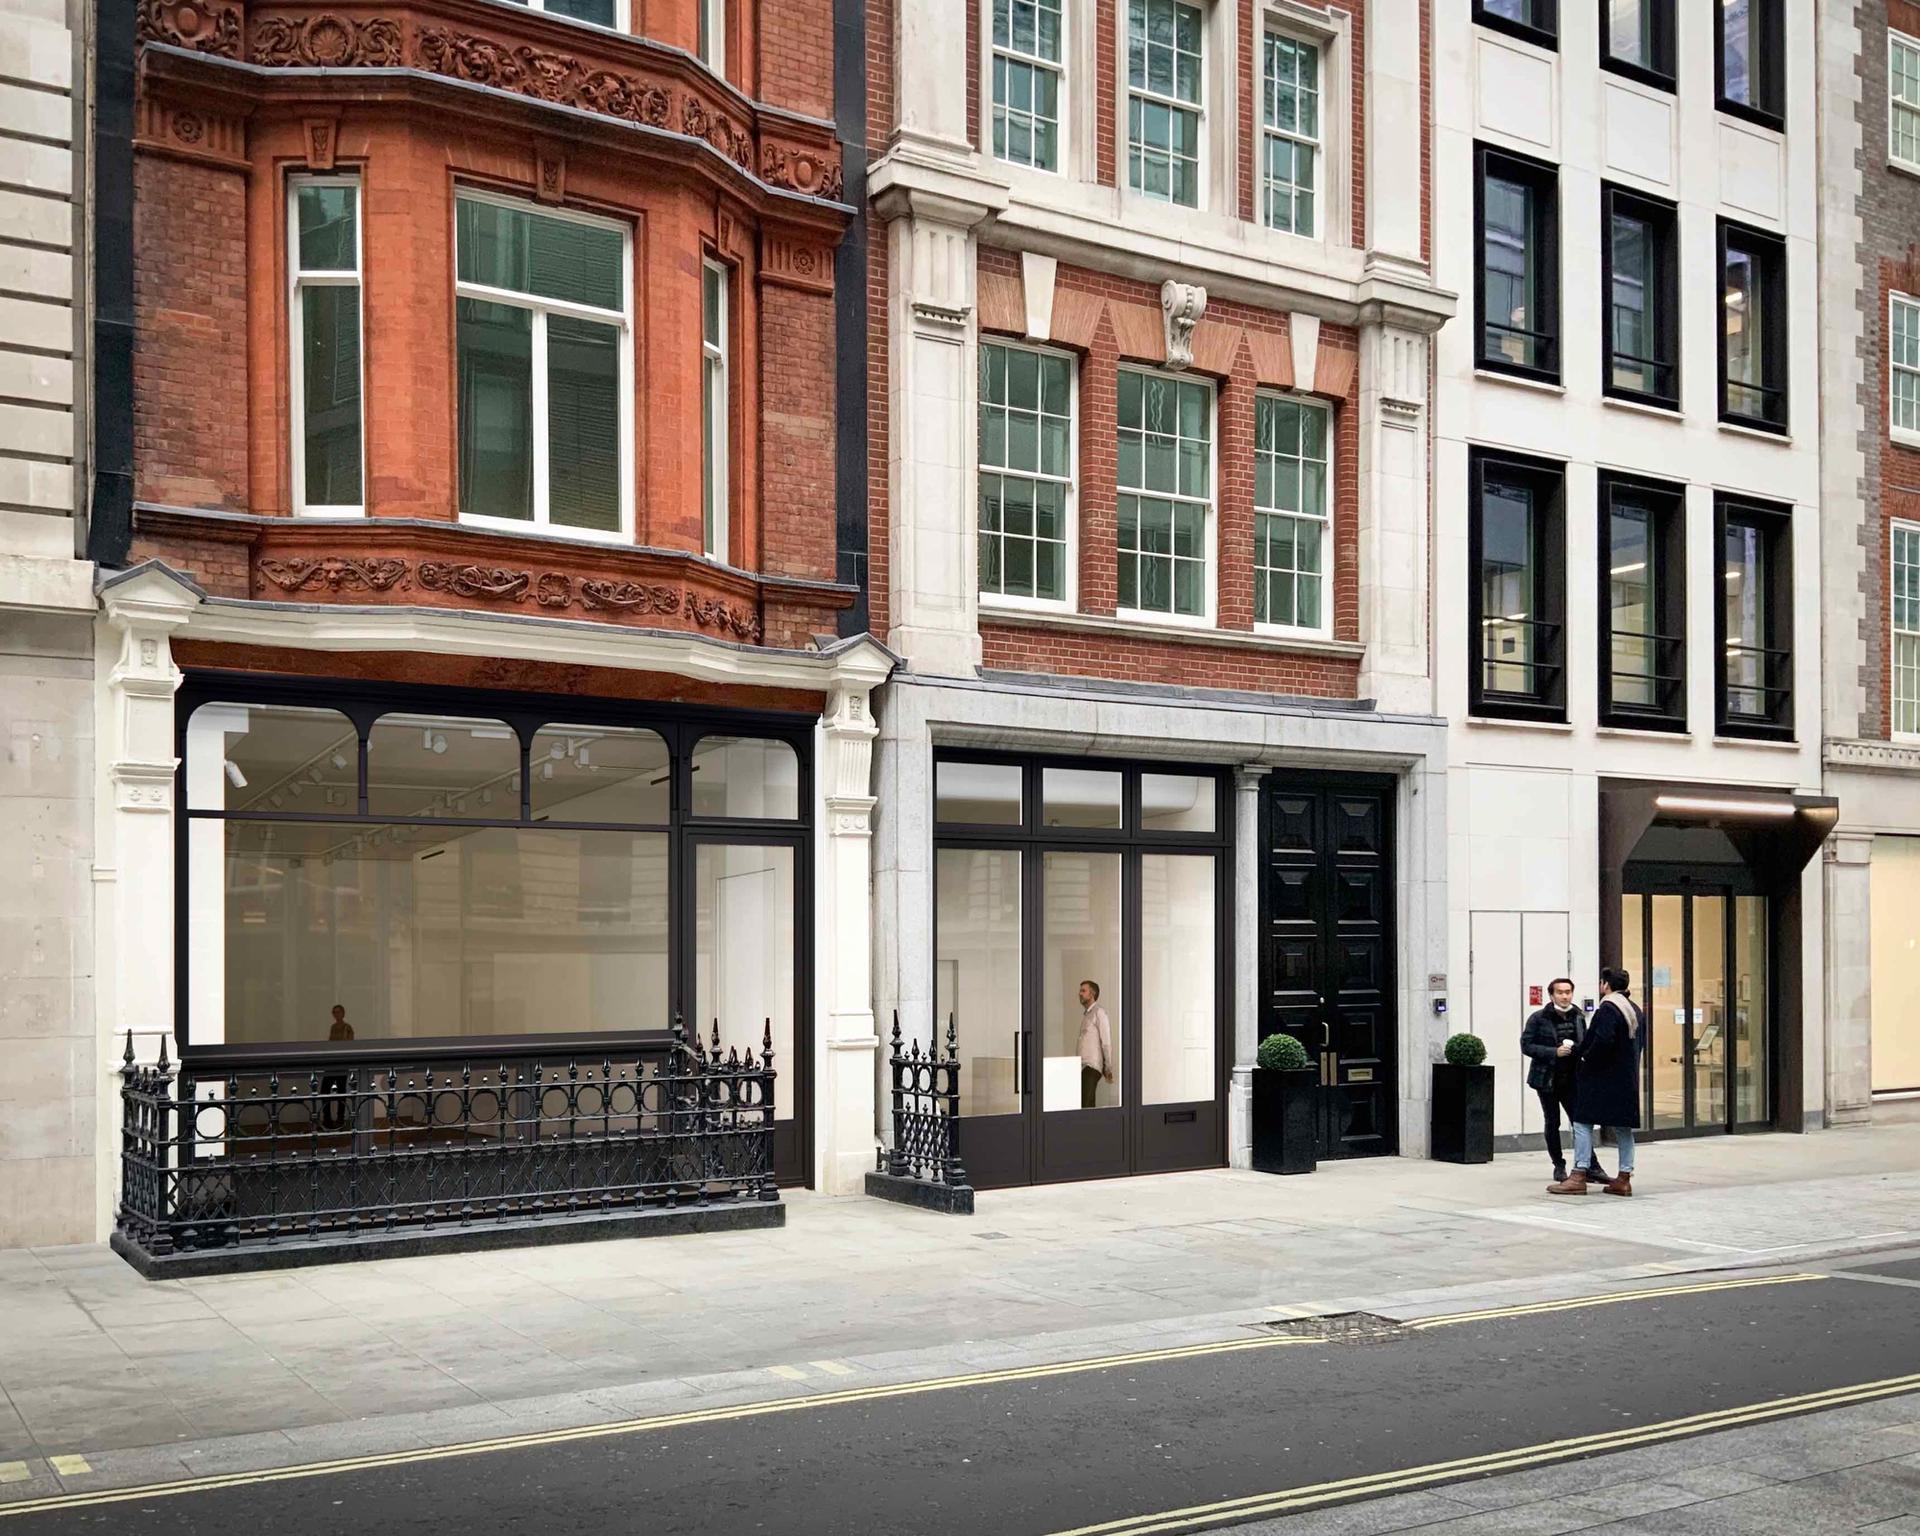 No.9 Cork Street, Frieze's new gallery space in Mayfair, London Courtesy of Frieze